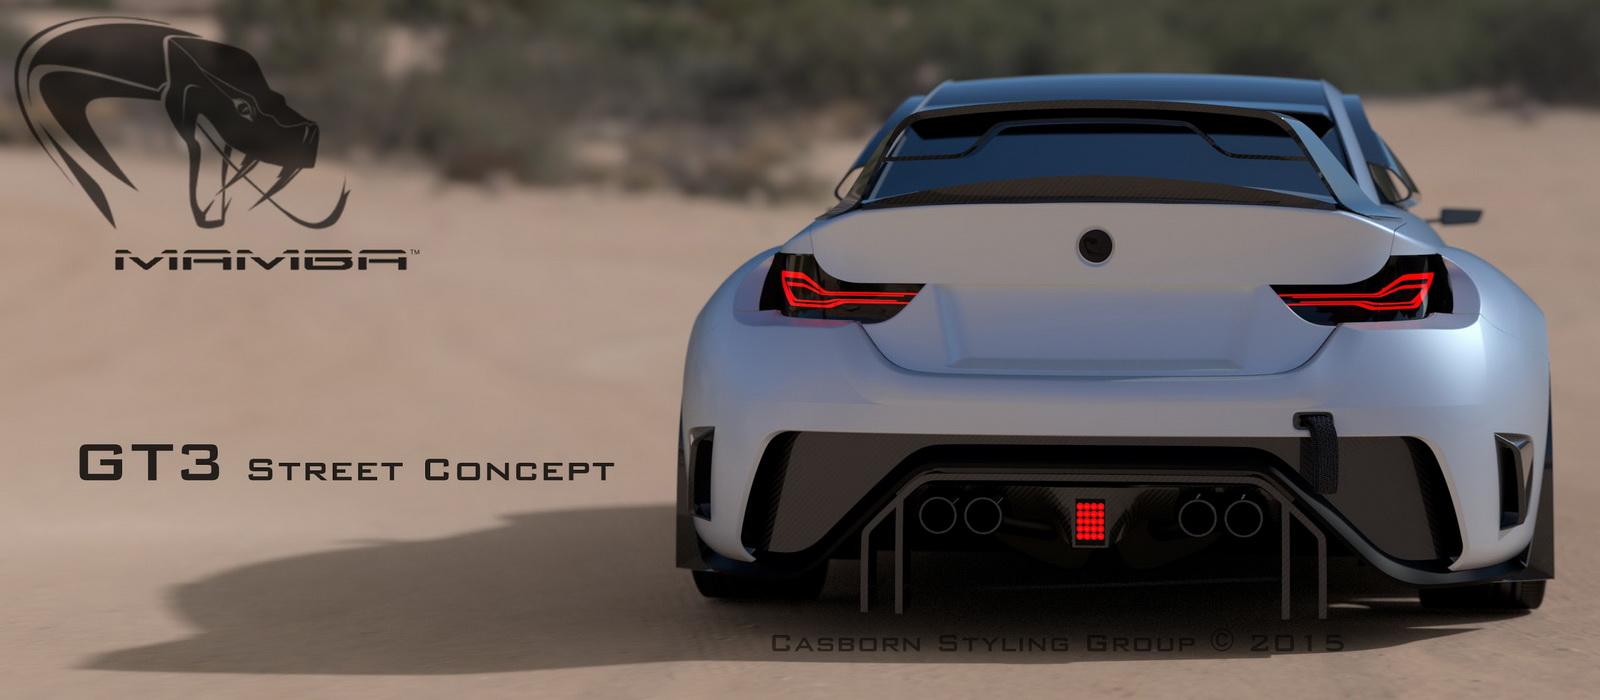 hoffy-automobiles-bmw-m4-mamba-gt3-street-concept-3.jpg